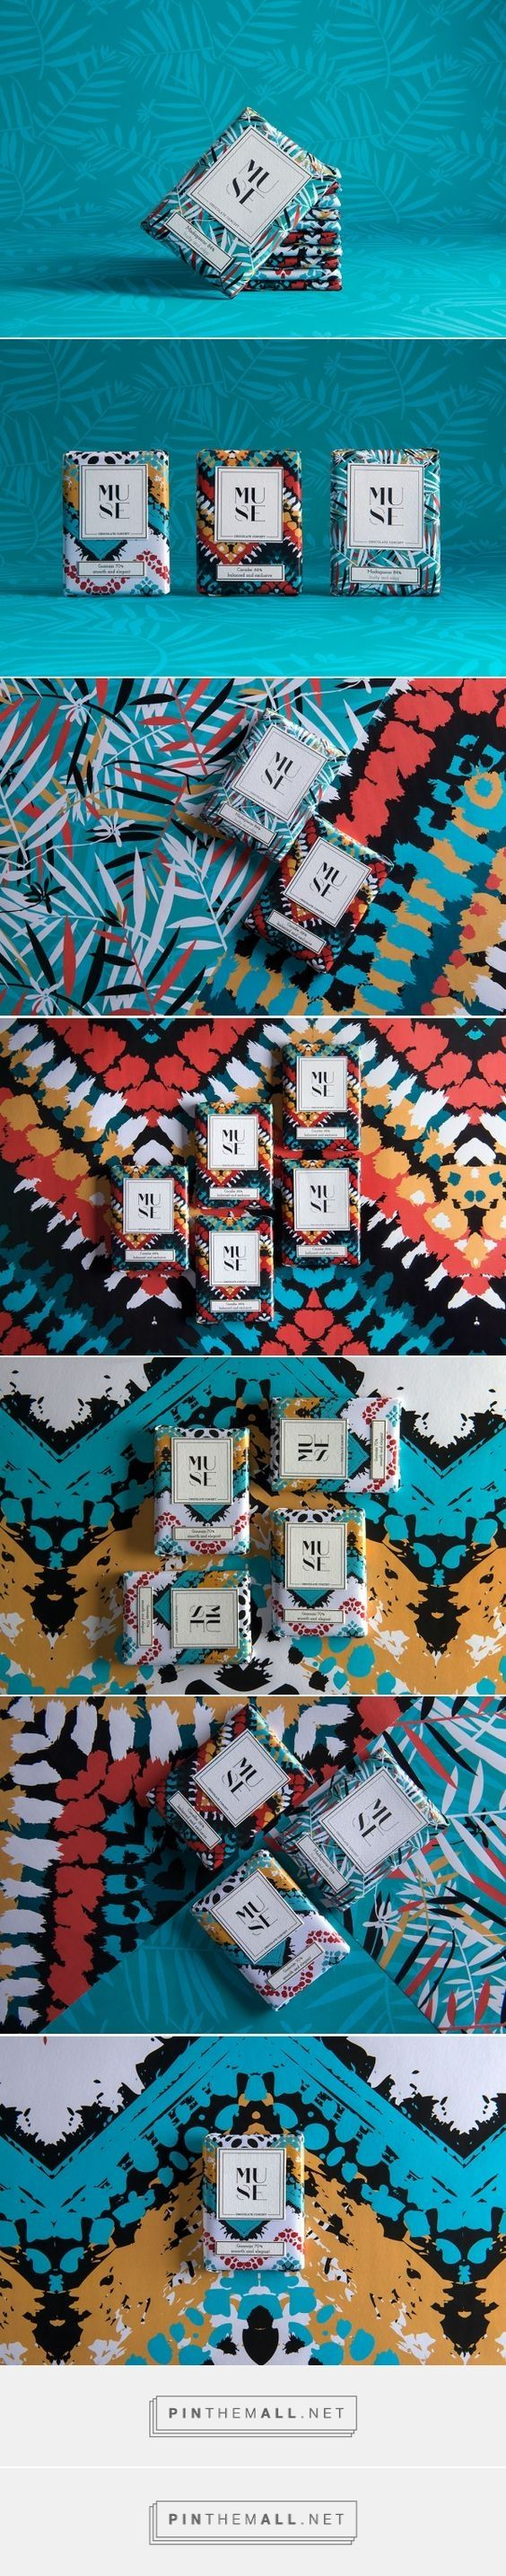 Muse Chocolate Origins Branding by Mo Kalache | Fivestar Branding – Design and Branding Agency & Inspiration Gallery